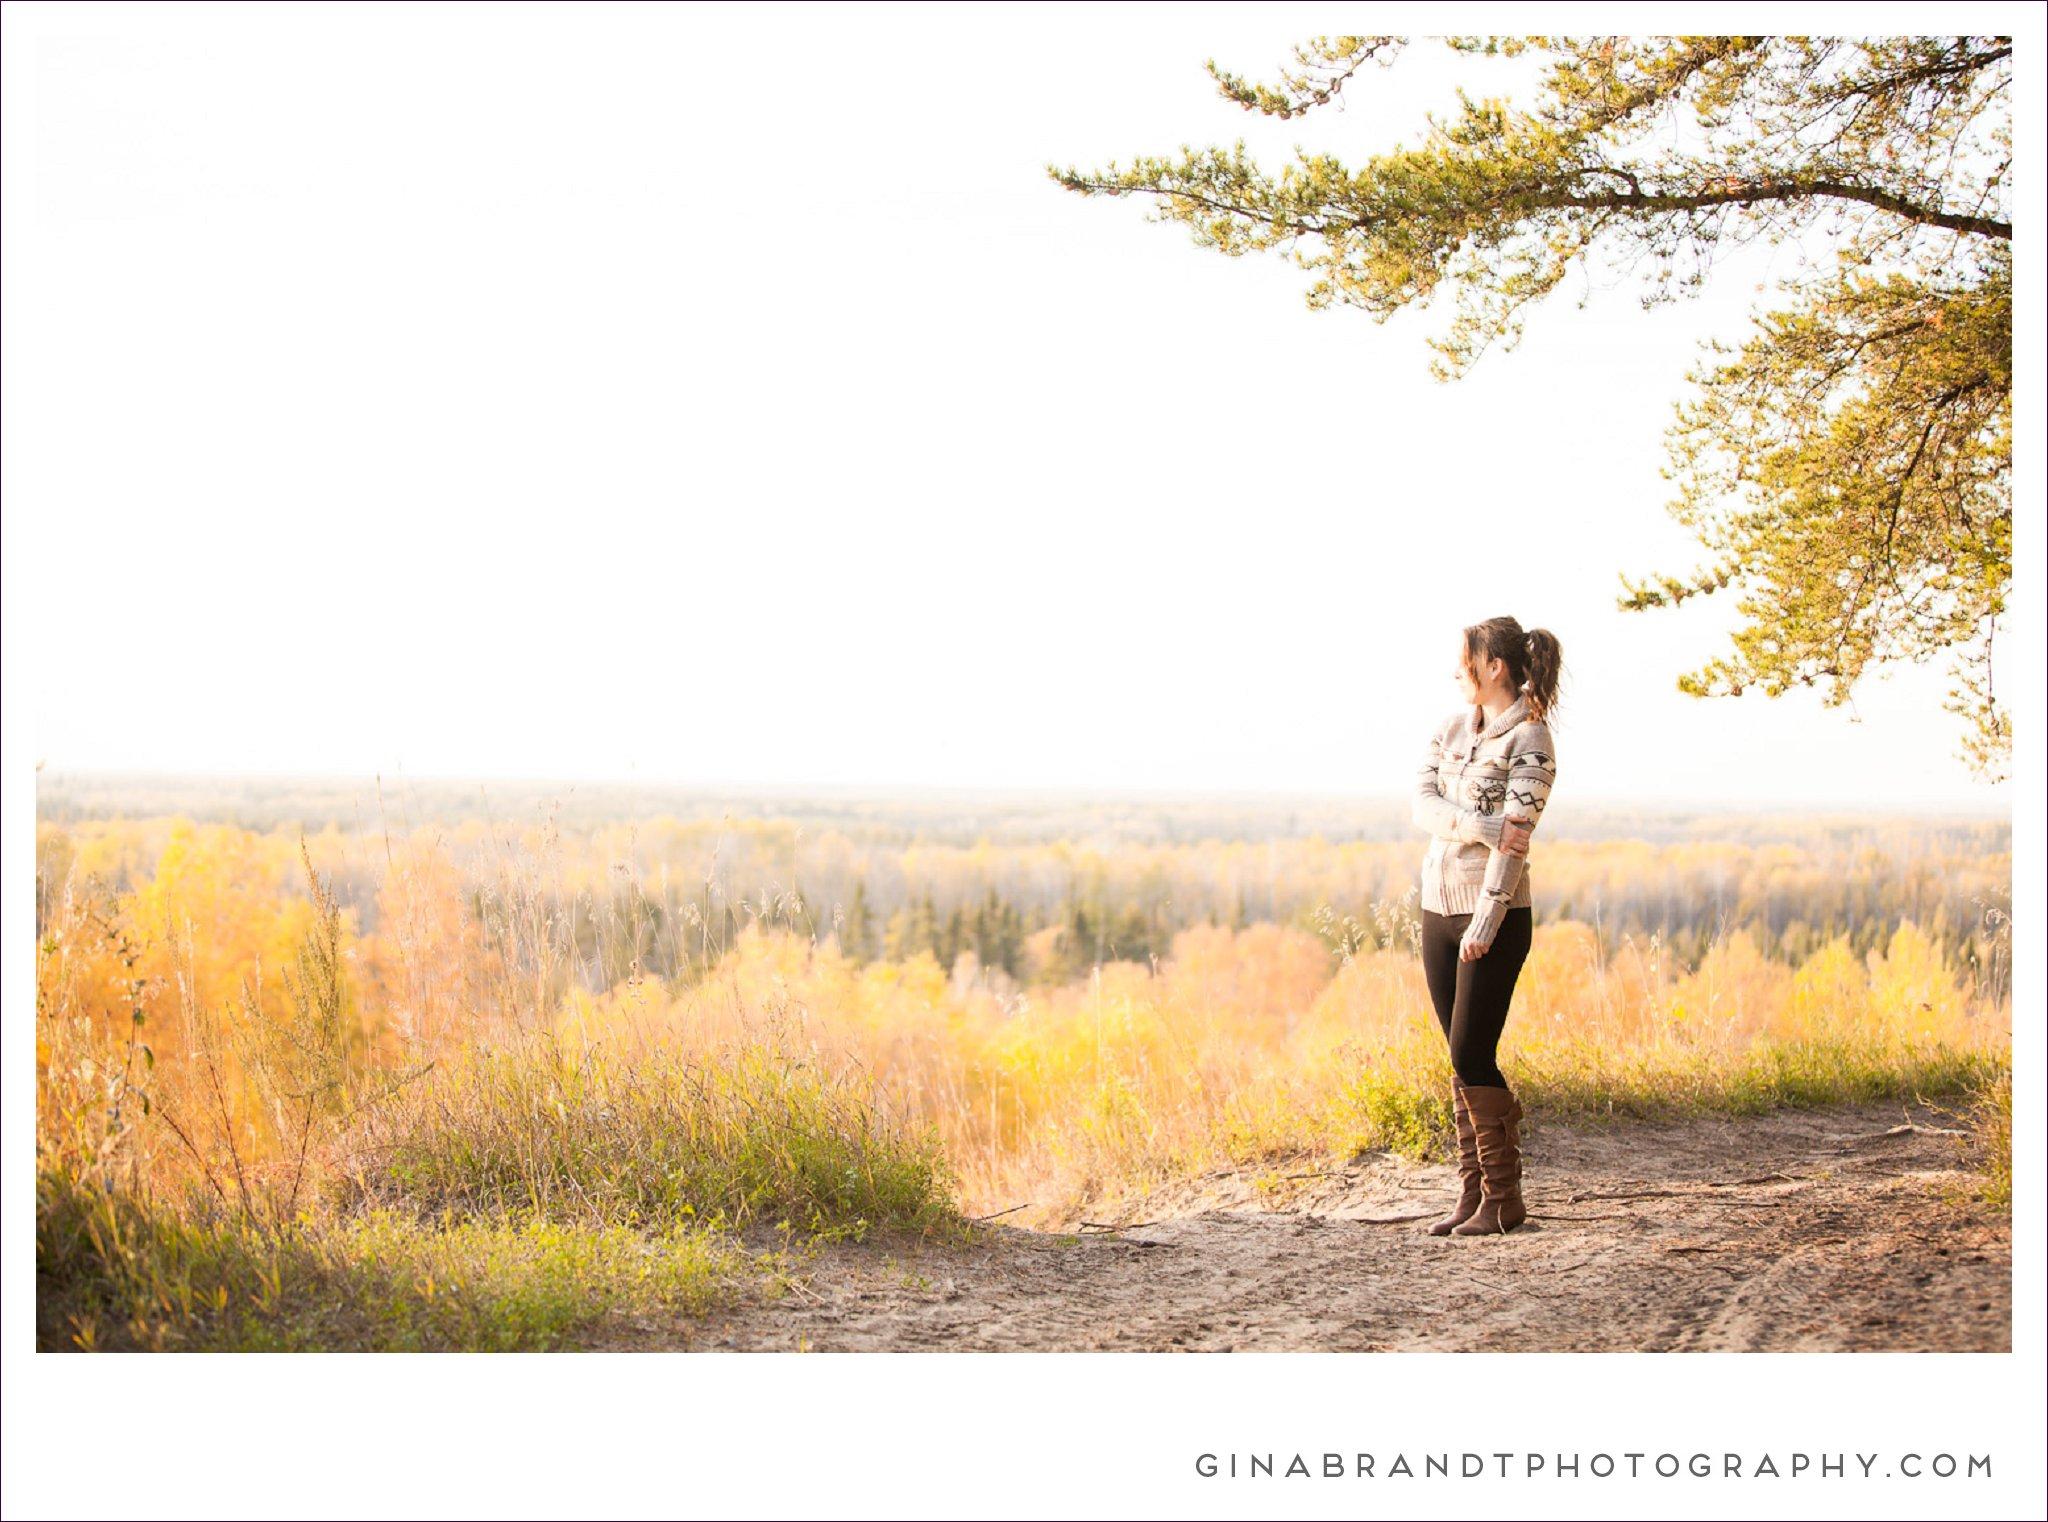 Gina Brandt Photography_0023.jpg